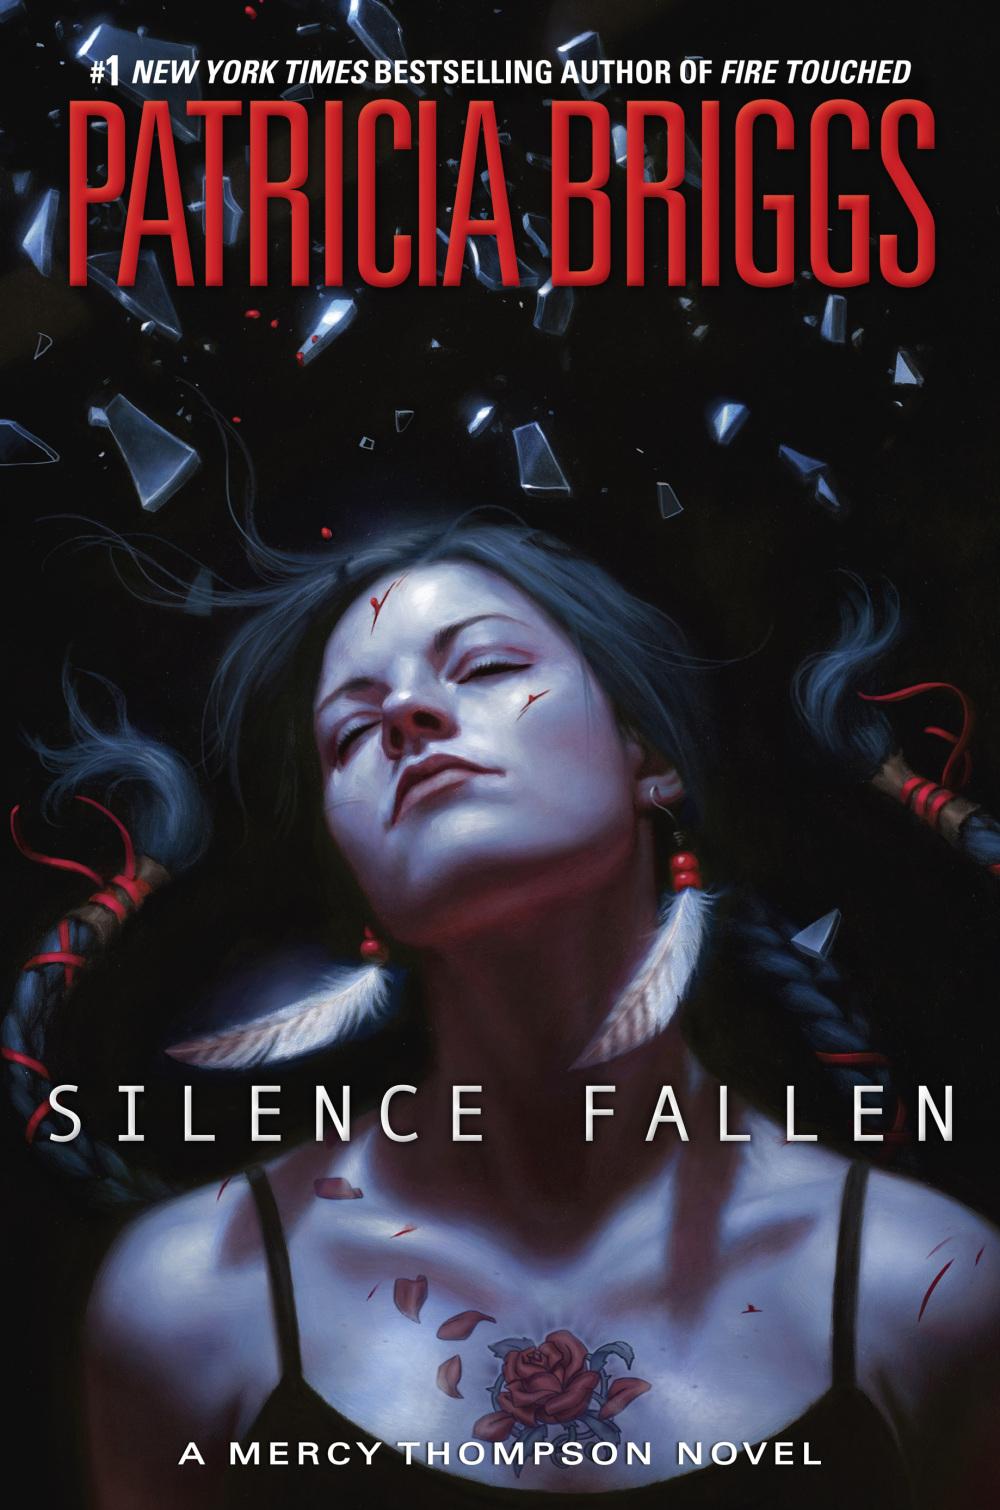 Patricia Briggs - Mercy Thompson 10 - Silence Fallen